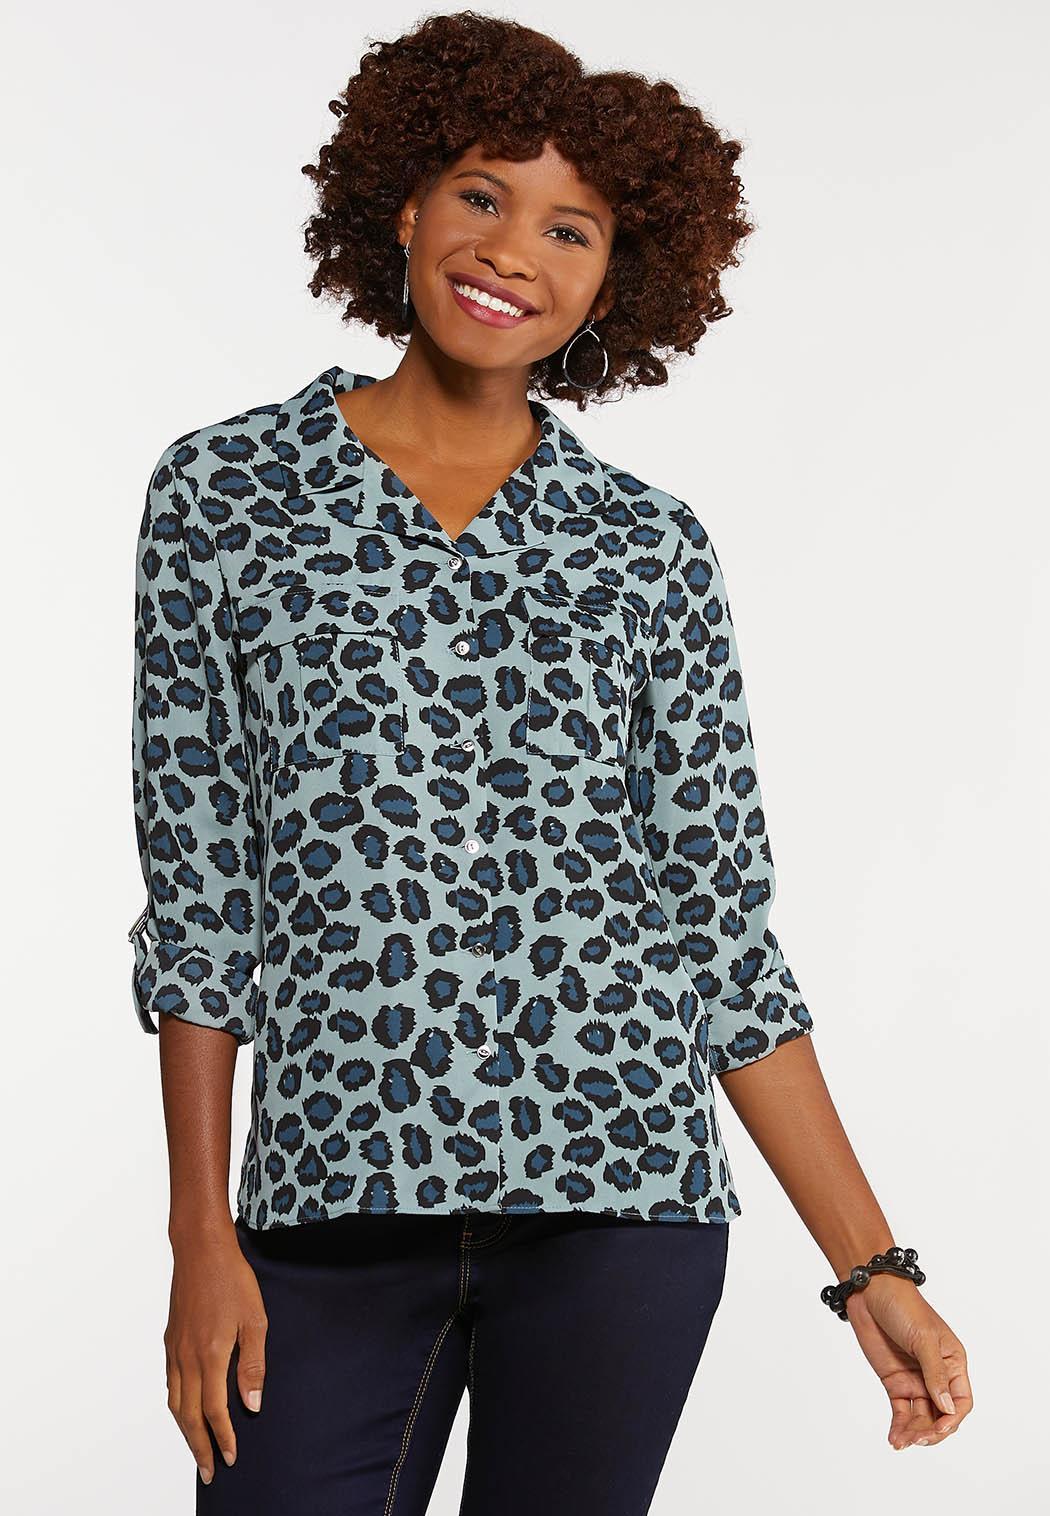 Blue Gray Leopard Top